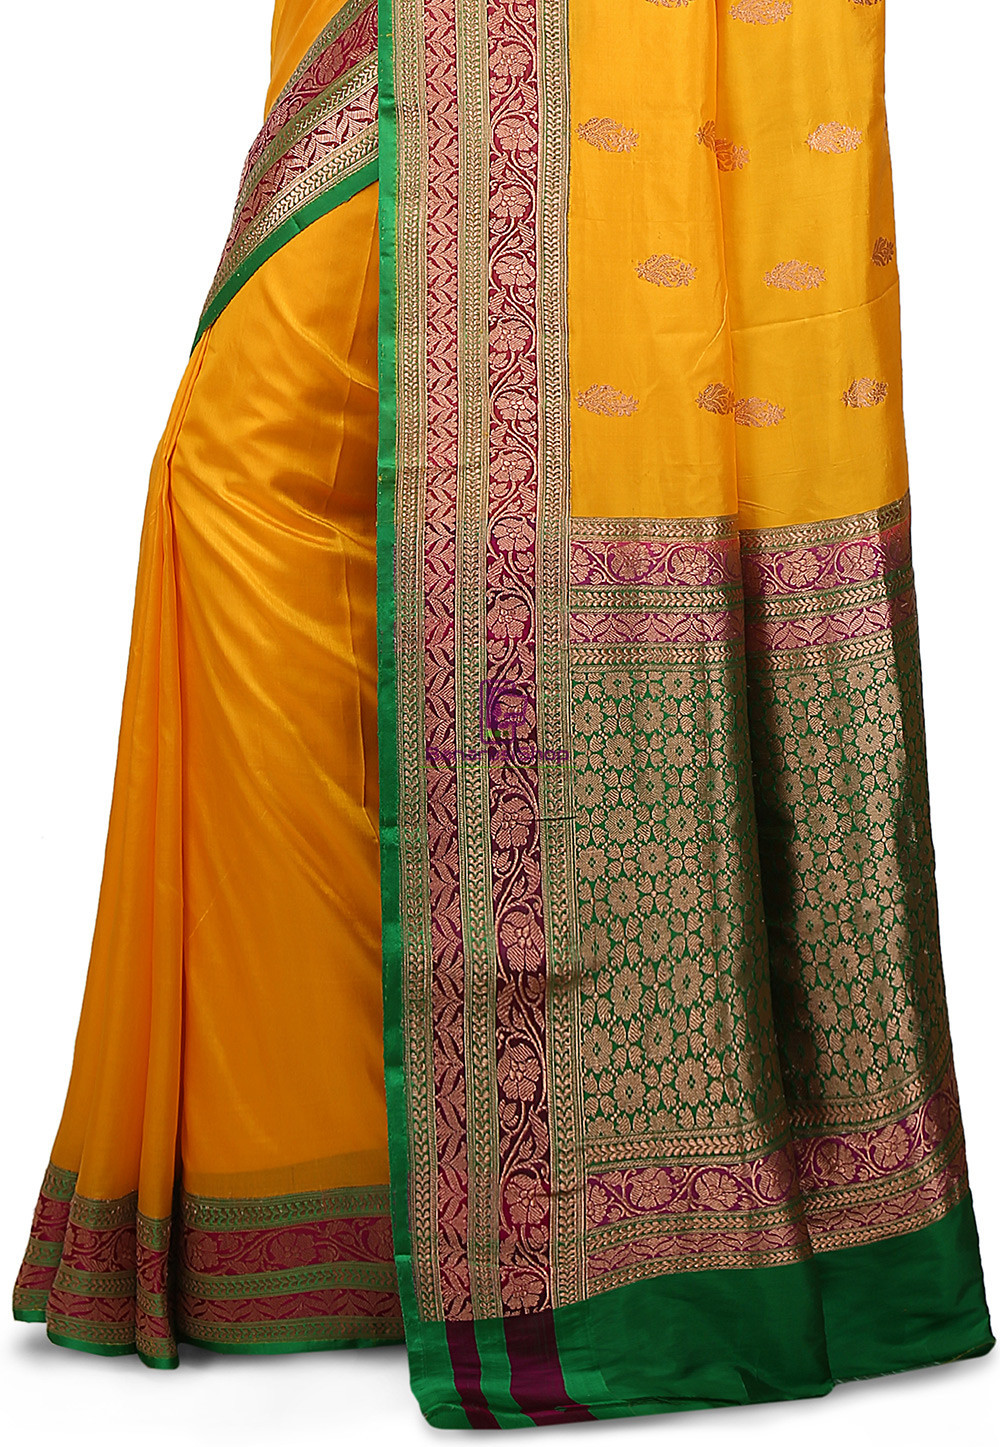 Banarasi Pure Katan Silk Handloom Saree in Yellow 3